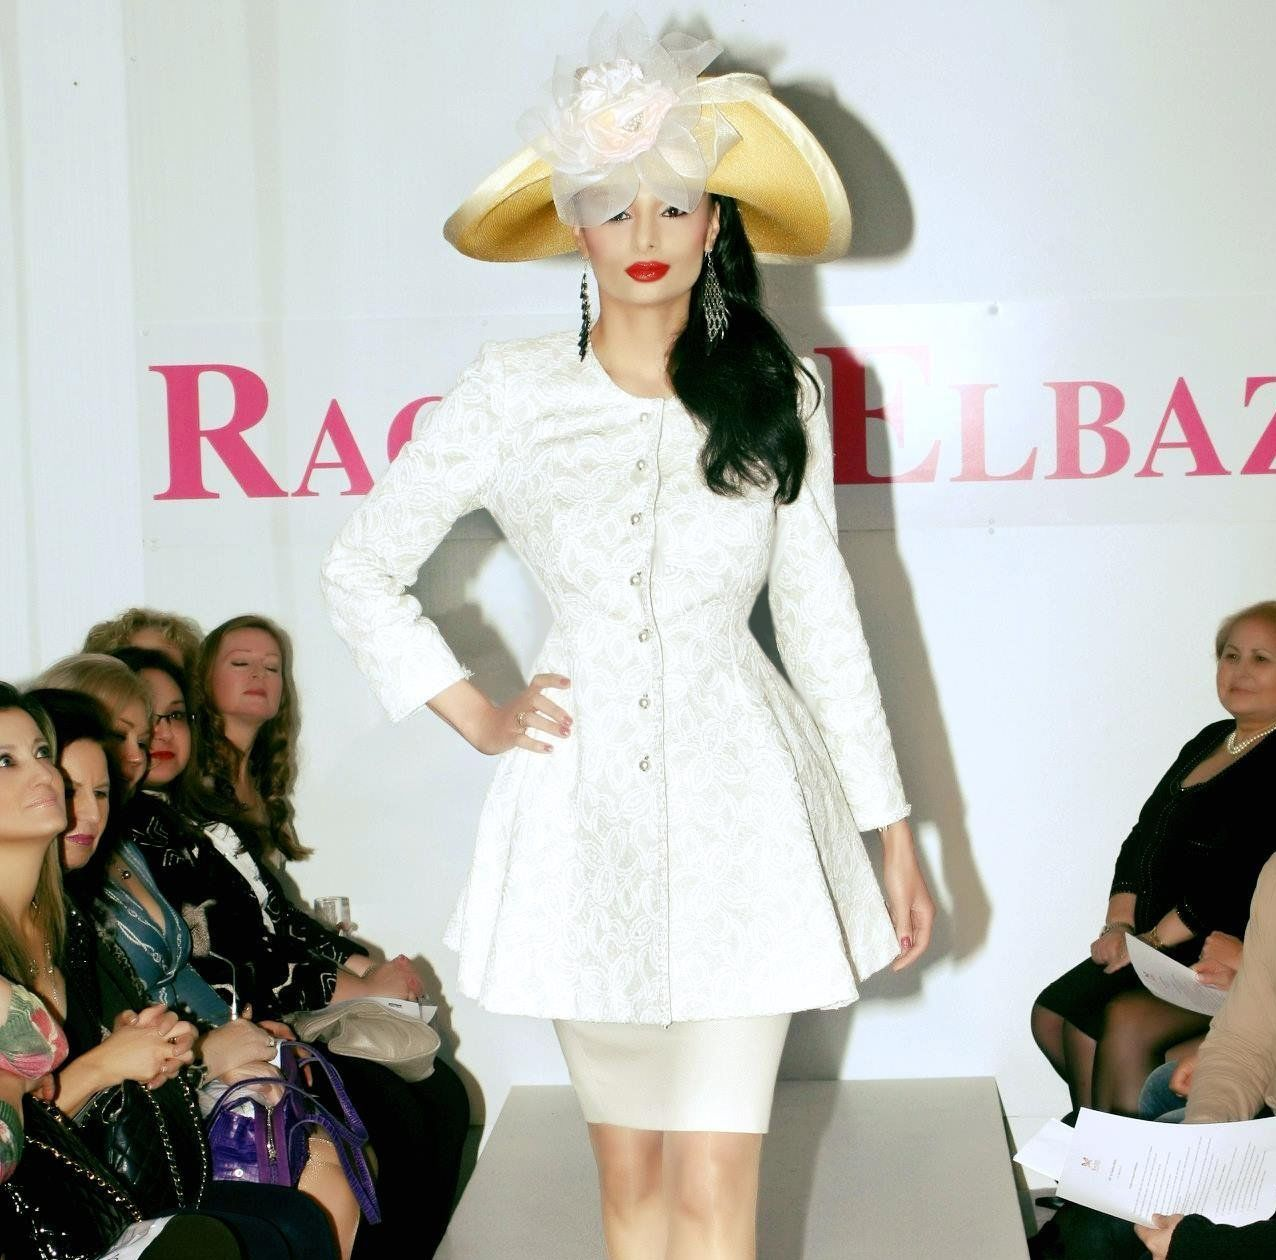 Rachel Elbaz Couture